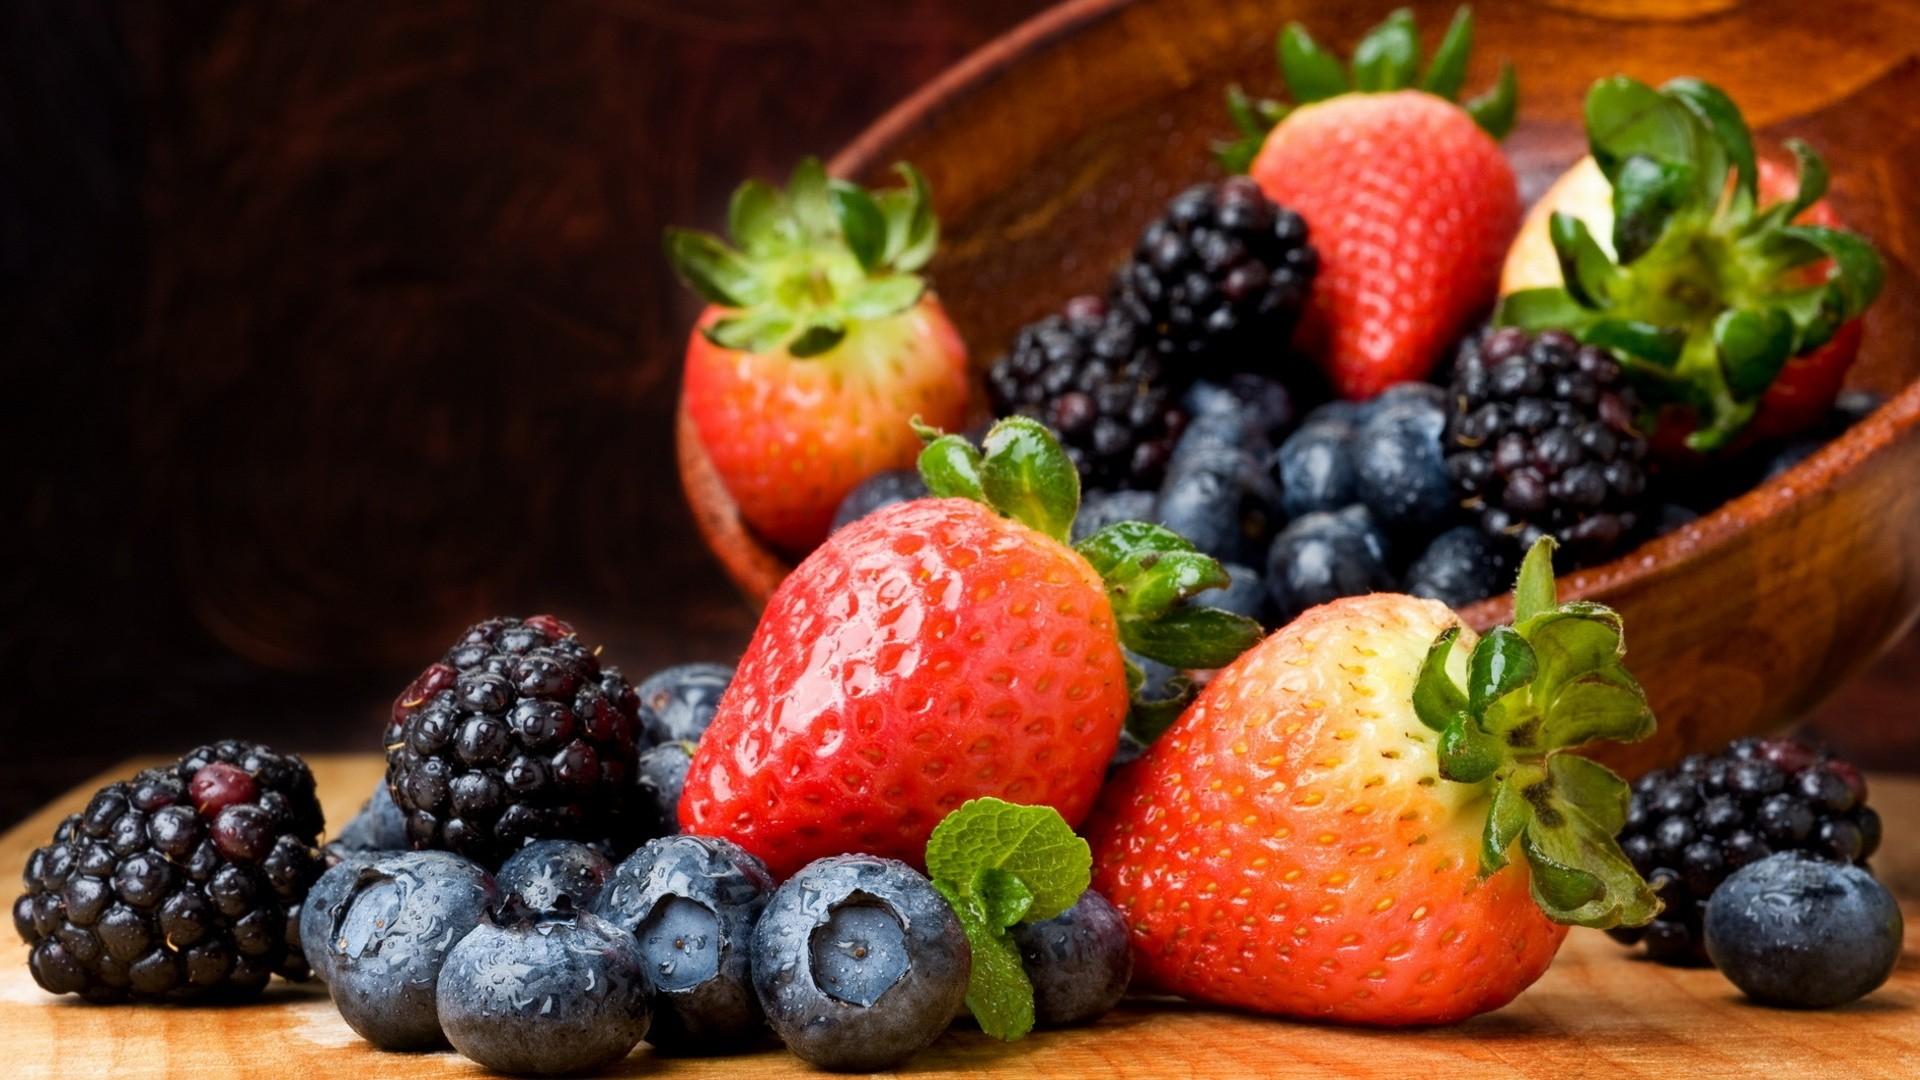 Fruits Food Wallpaper 1920x1080 Fruits Food Blackberry Fruit 1920x1080